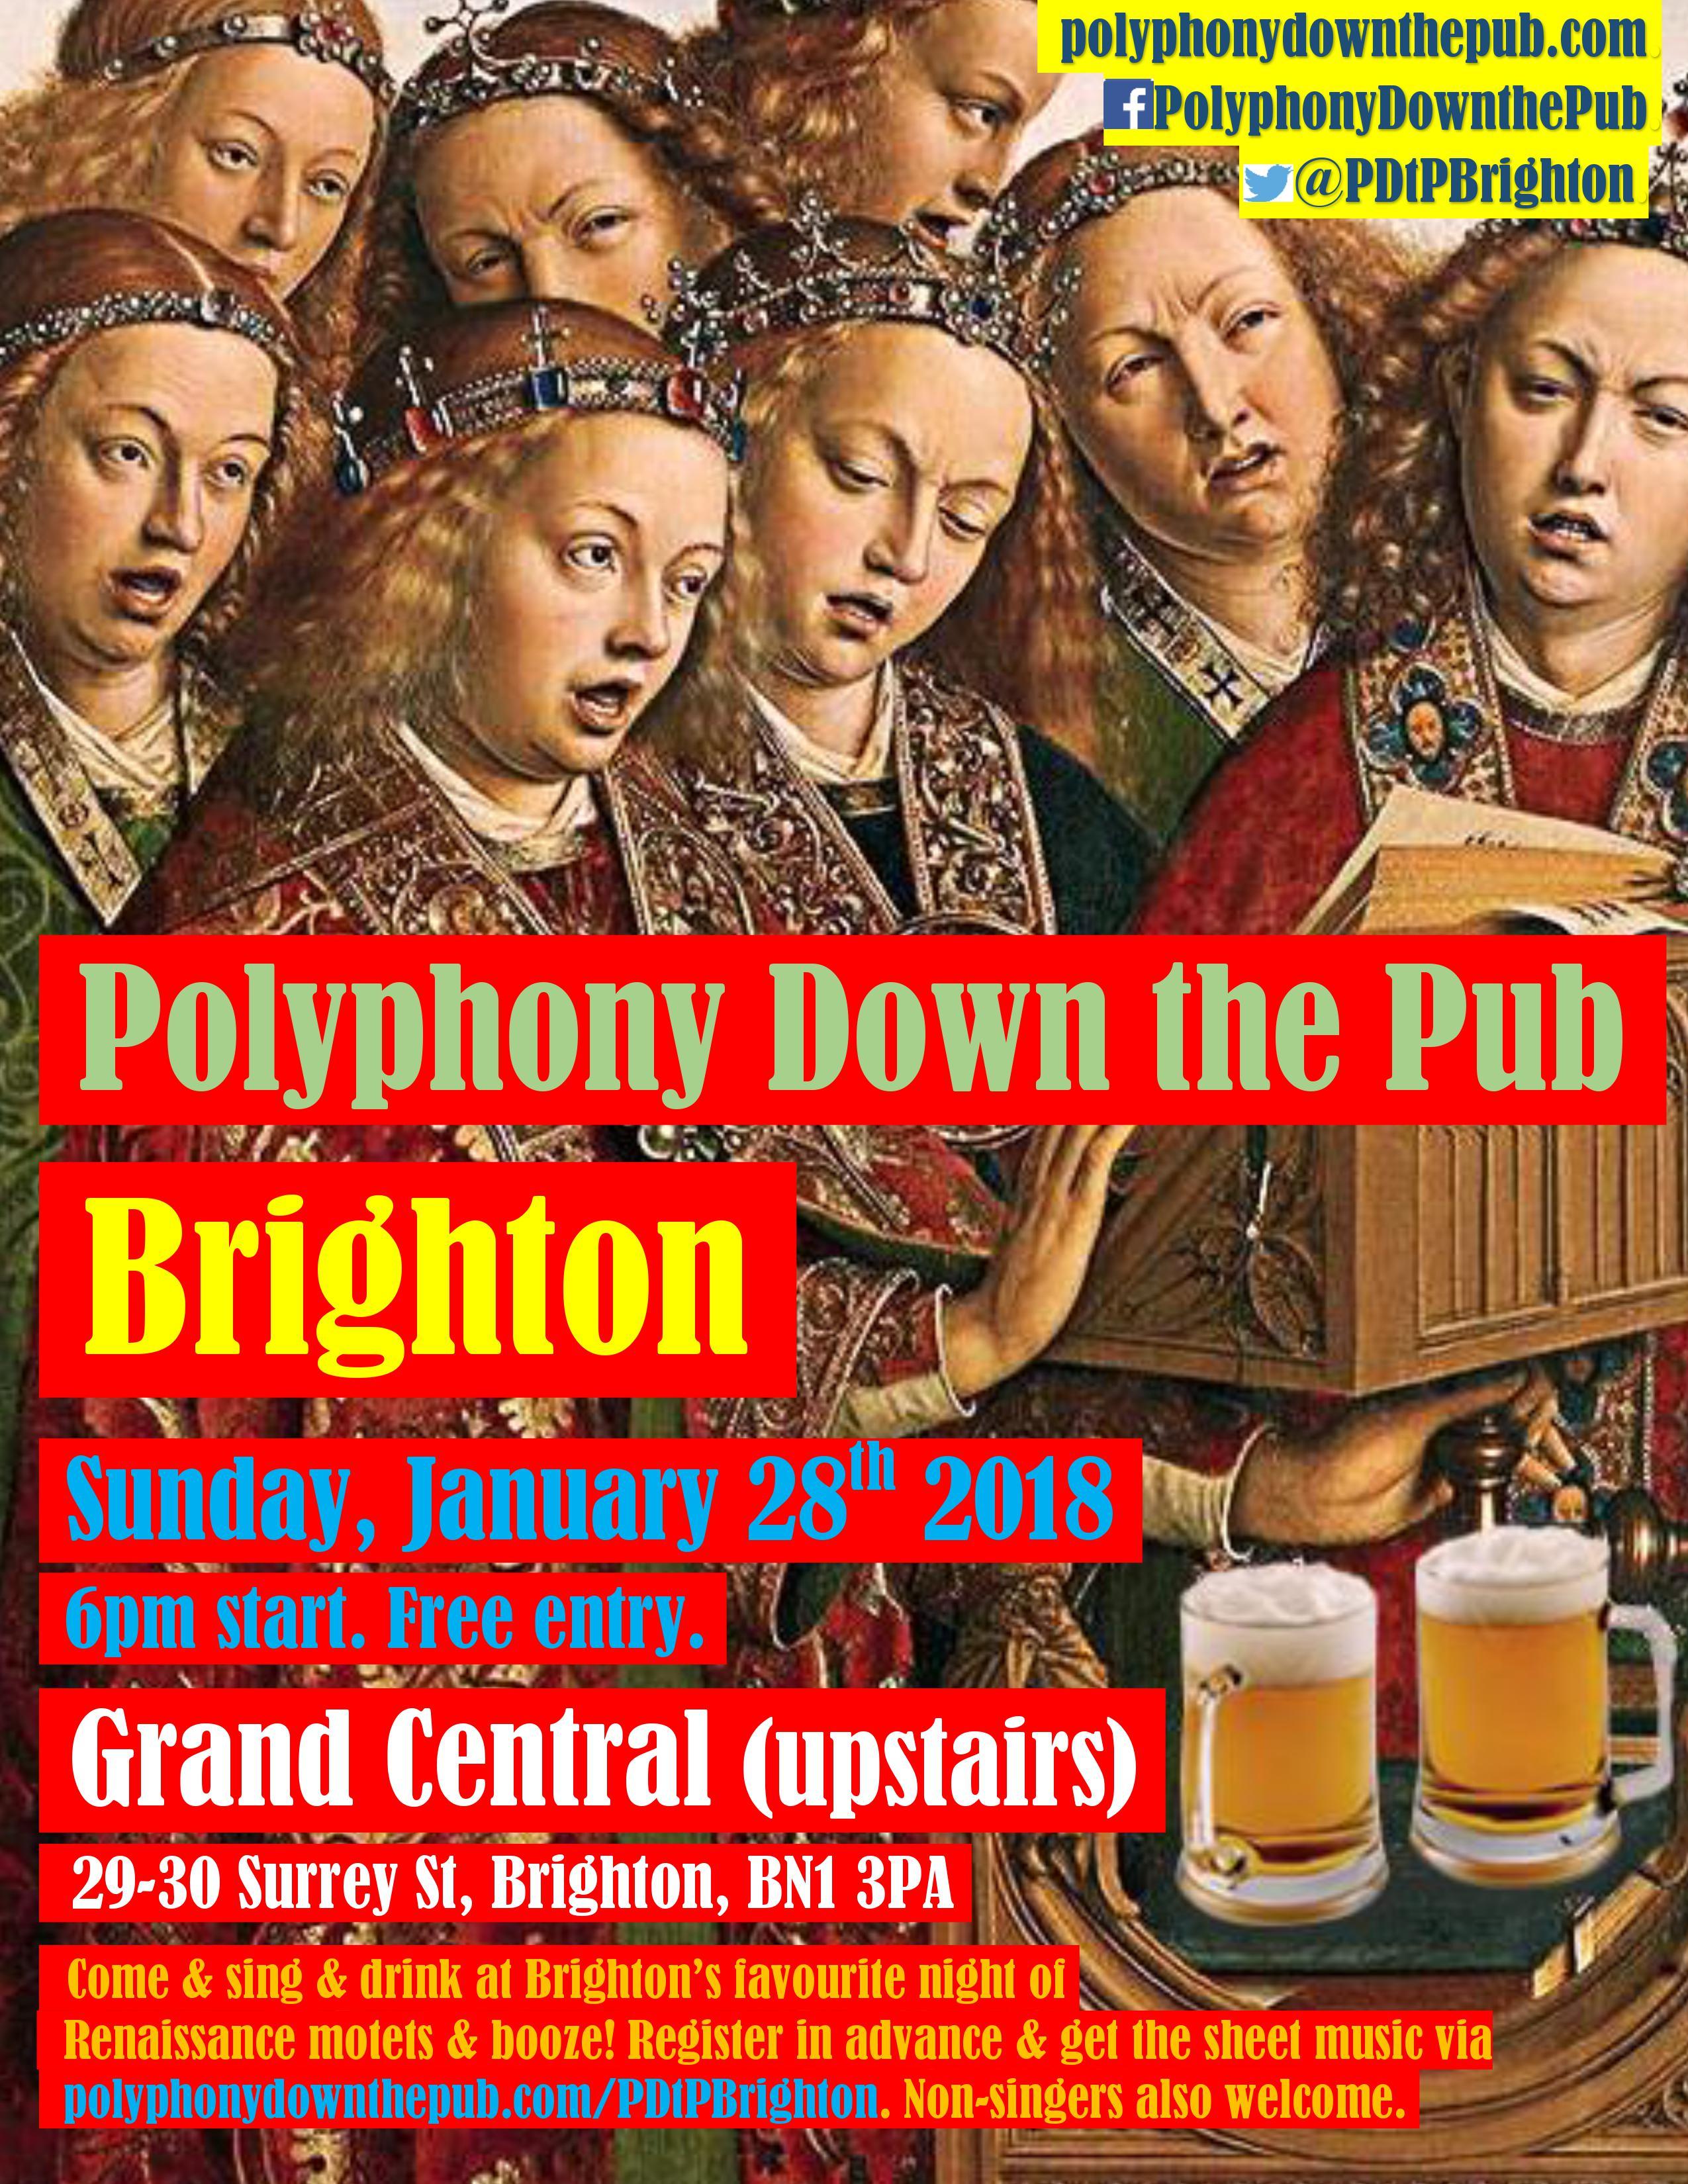 PDtP Brighton Jan 2018